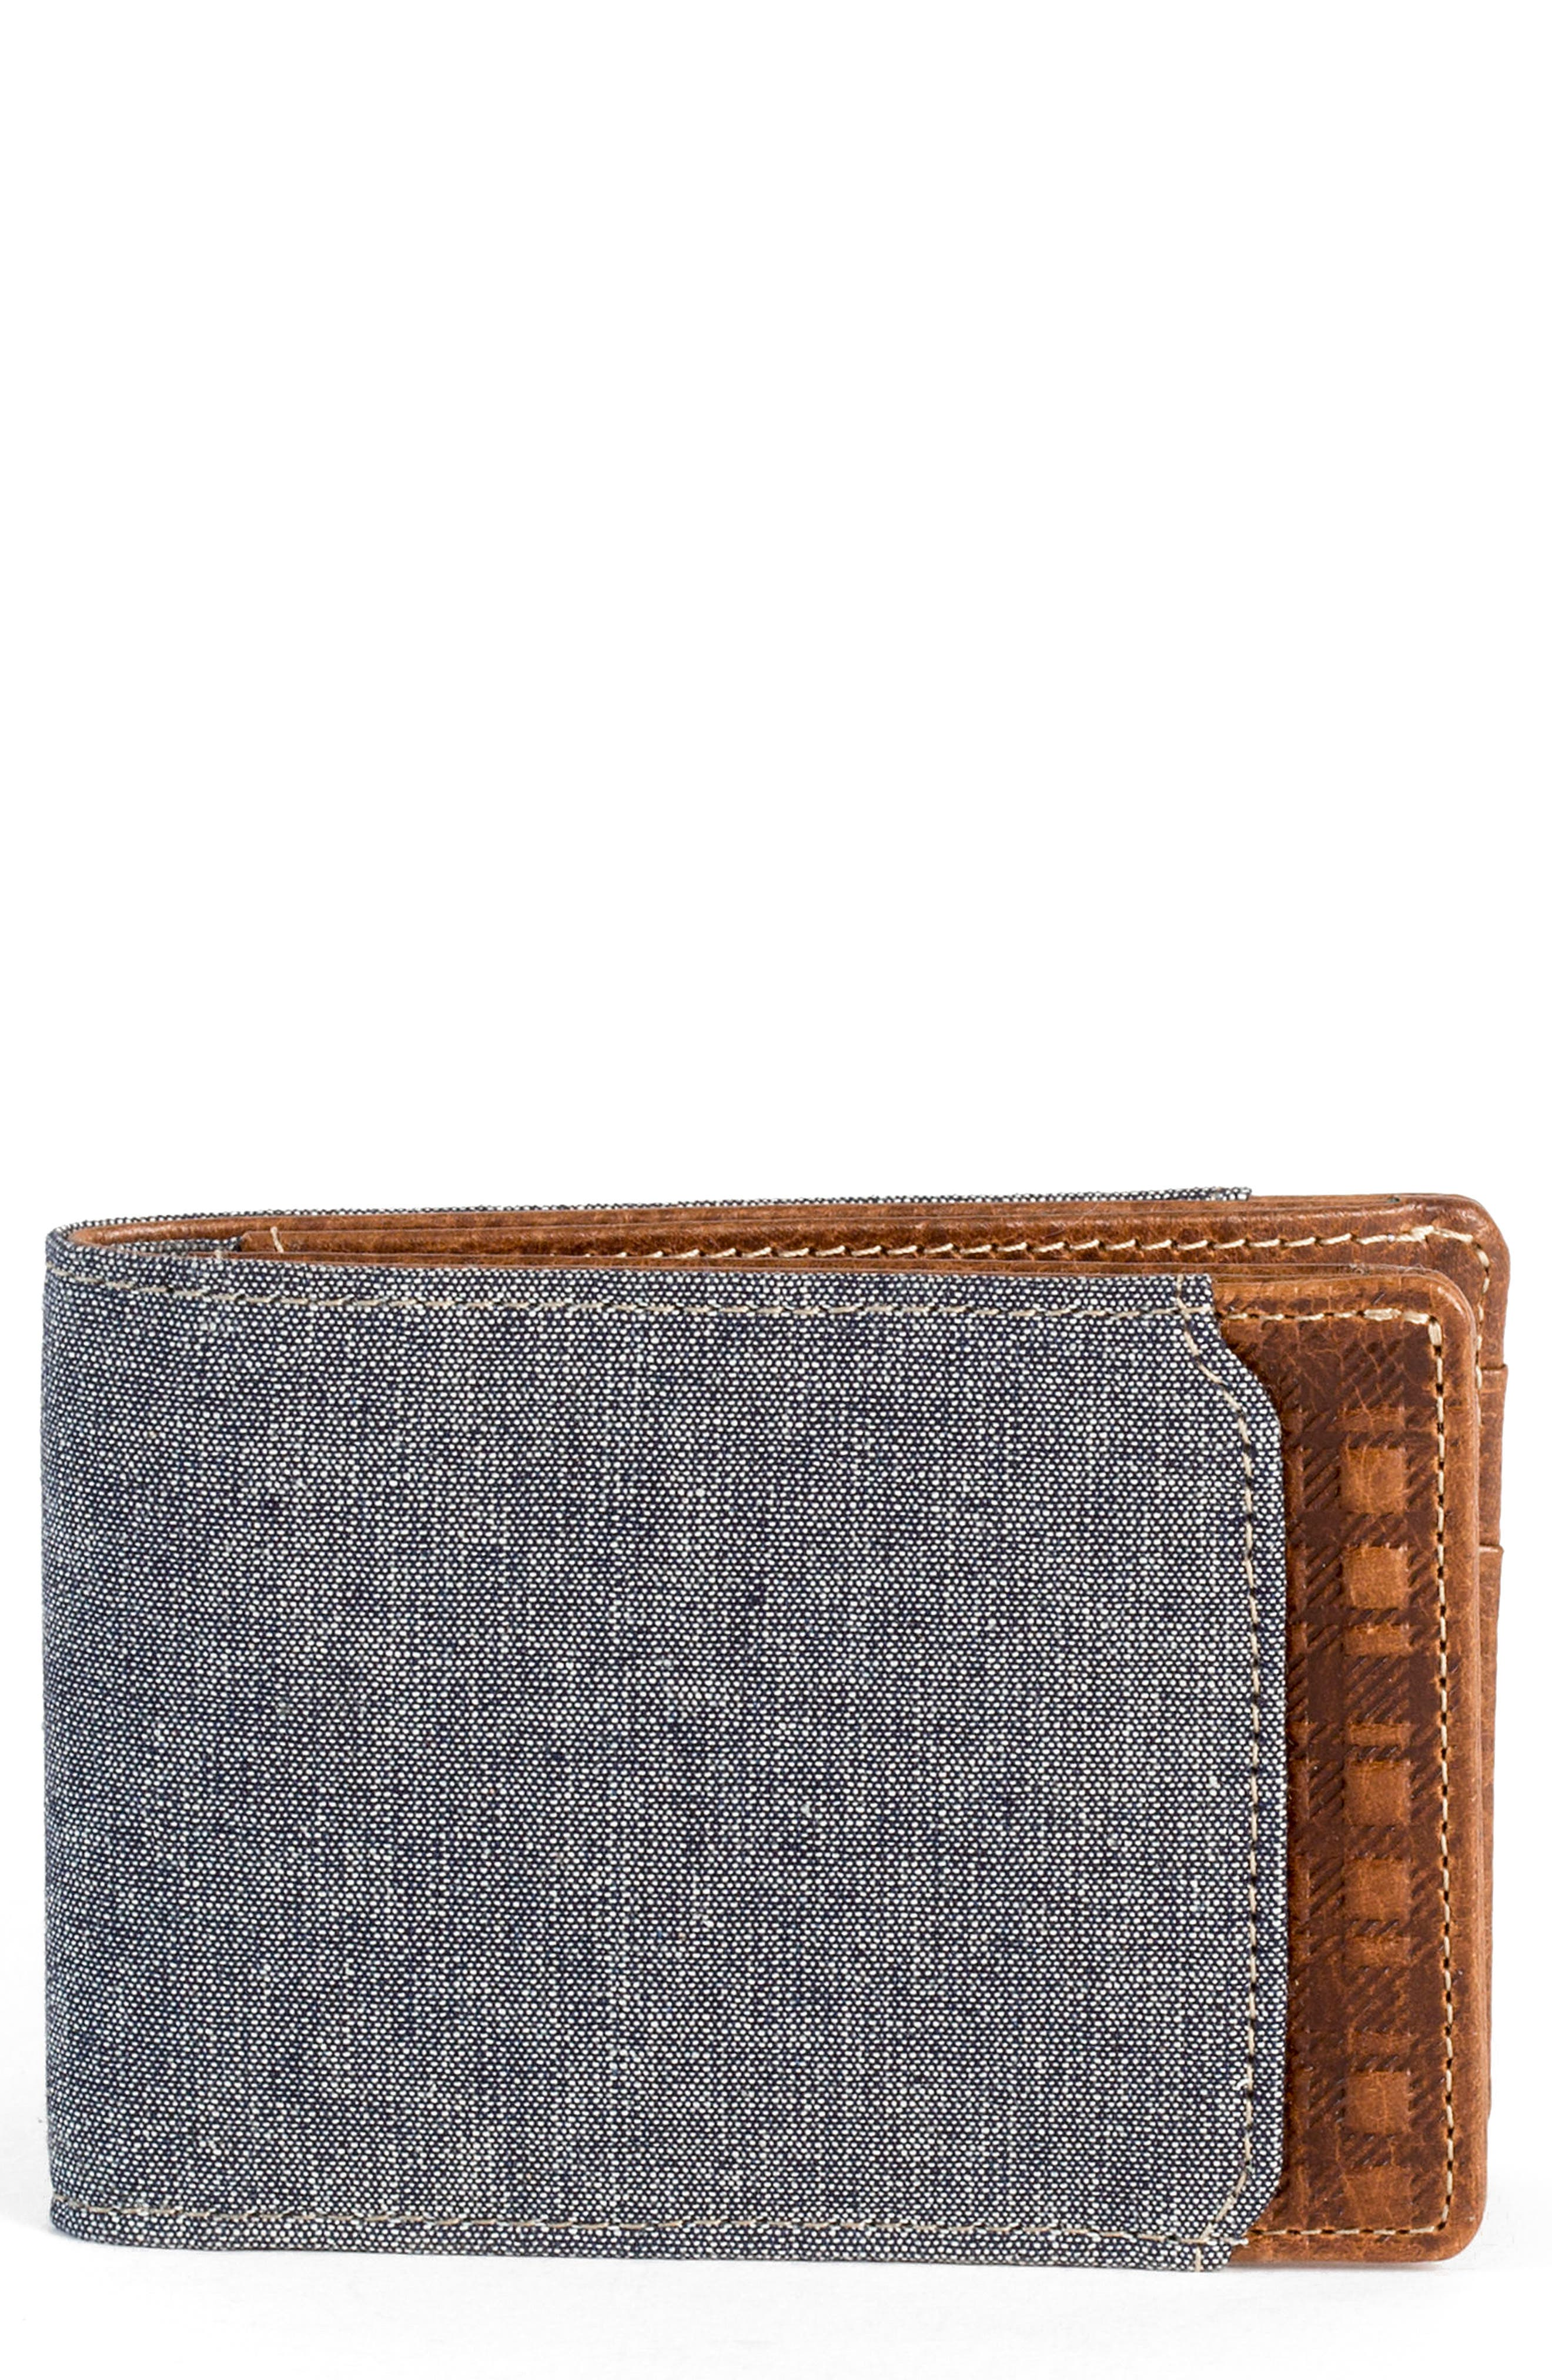 Caleb LTE Wallet,                             Main thumbnail 1, color,                             Chestnut